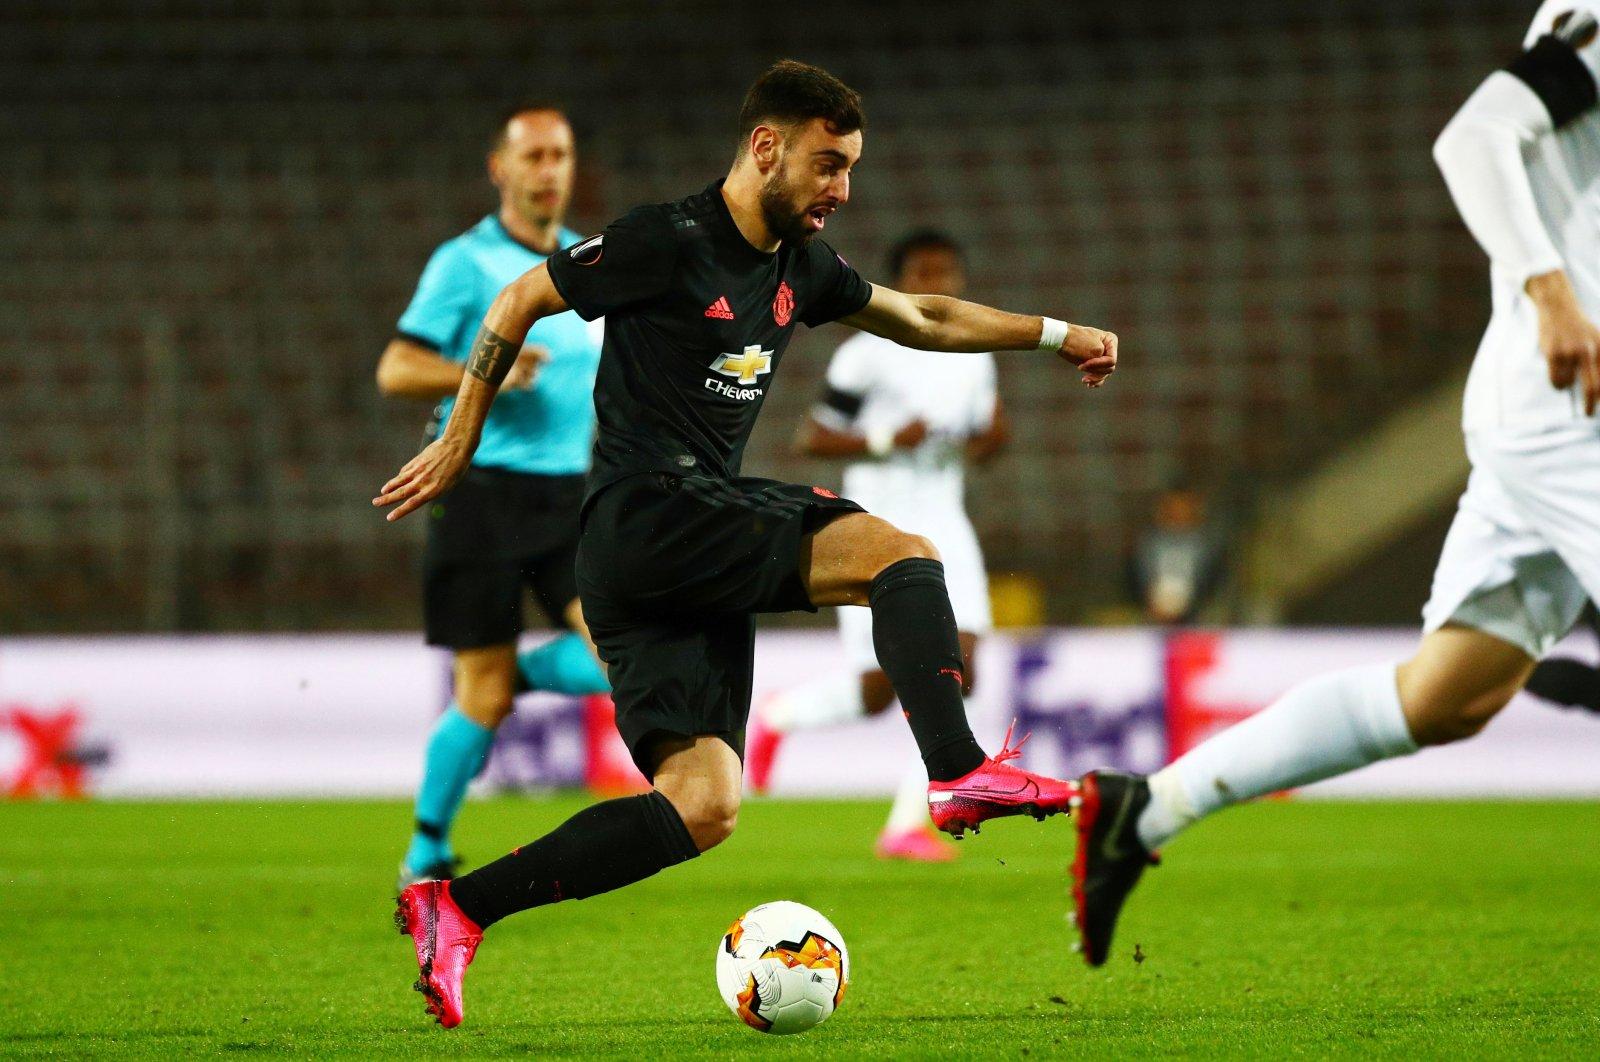 Manchester United's Bruno Fernandes in action against LASK Linz, Linz, Austria, March 12, 2020. (Reuters Photo)